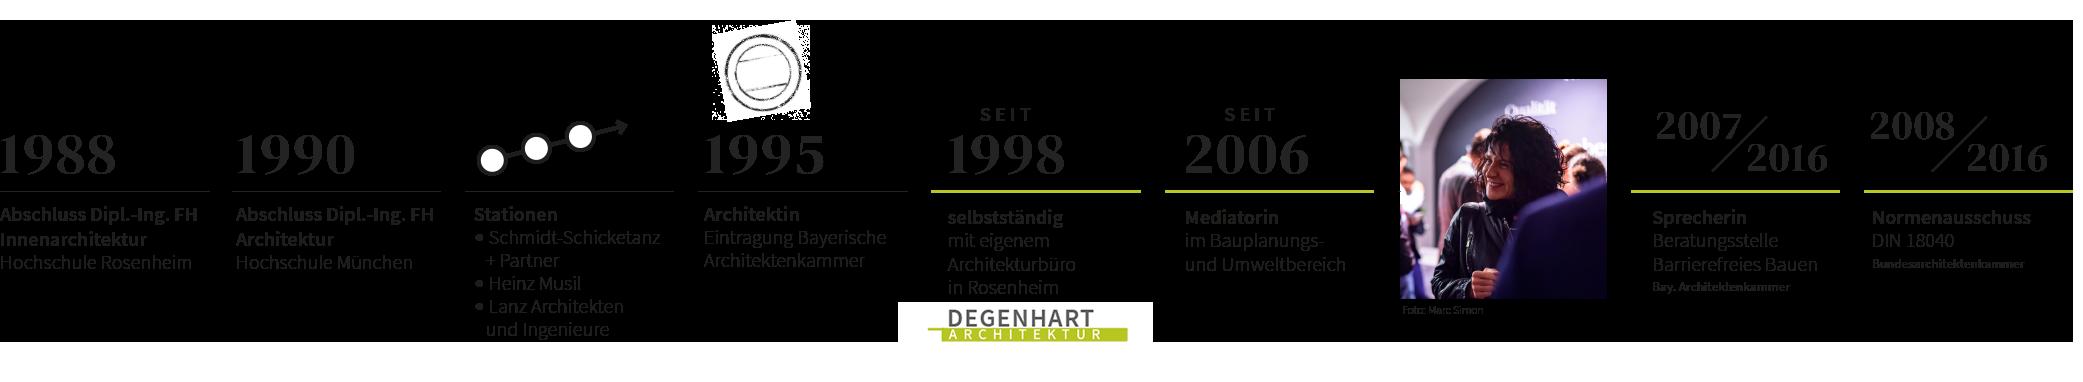 Christine Degenhart - Timeline / Lebenslauf